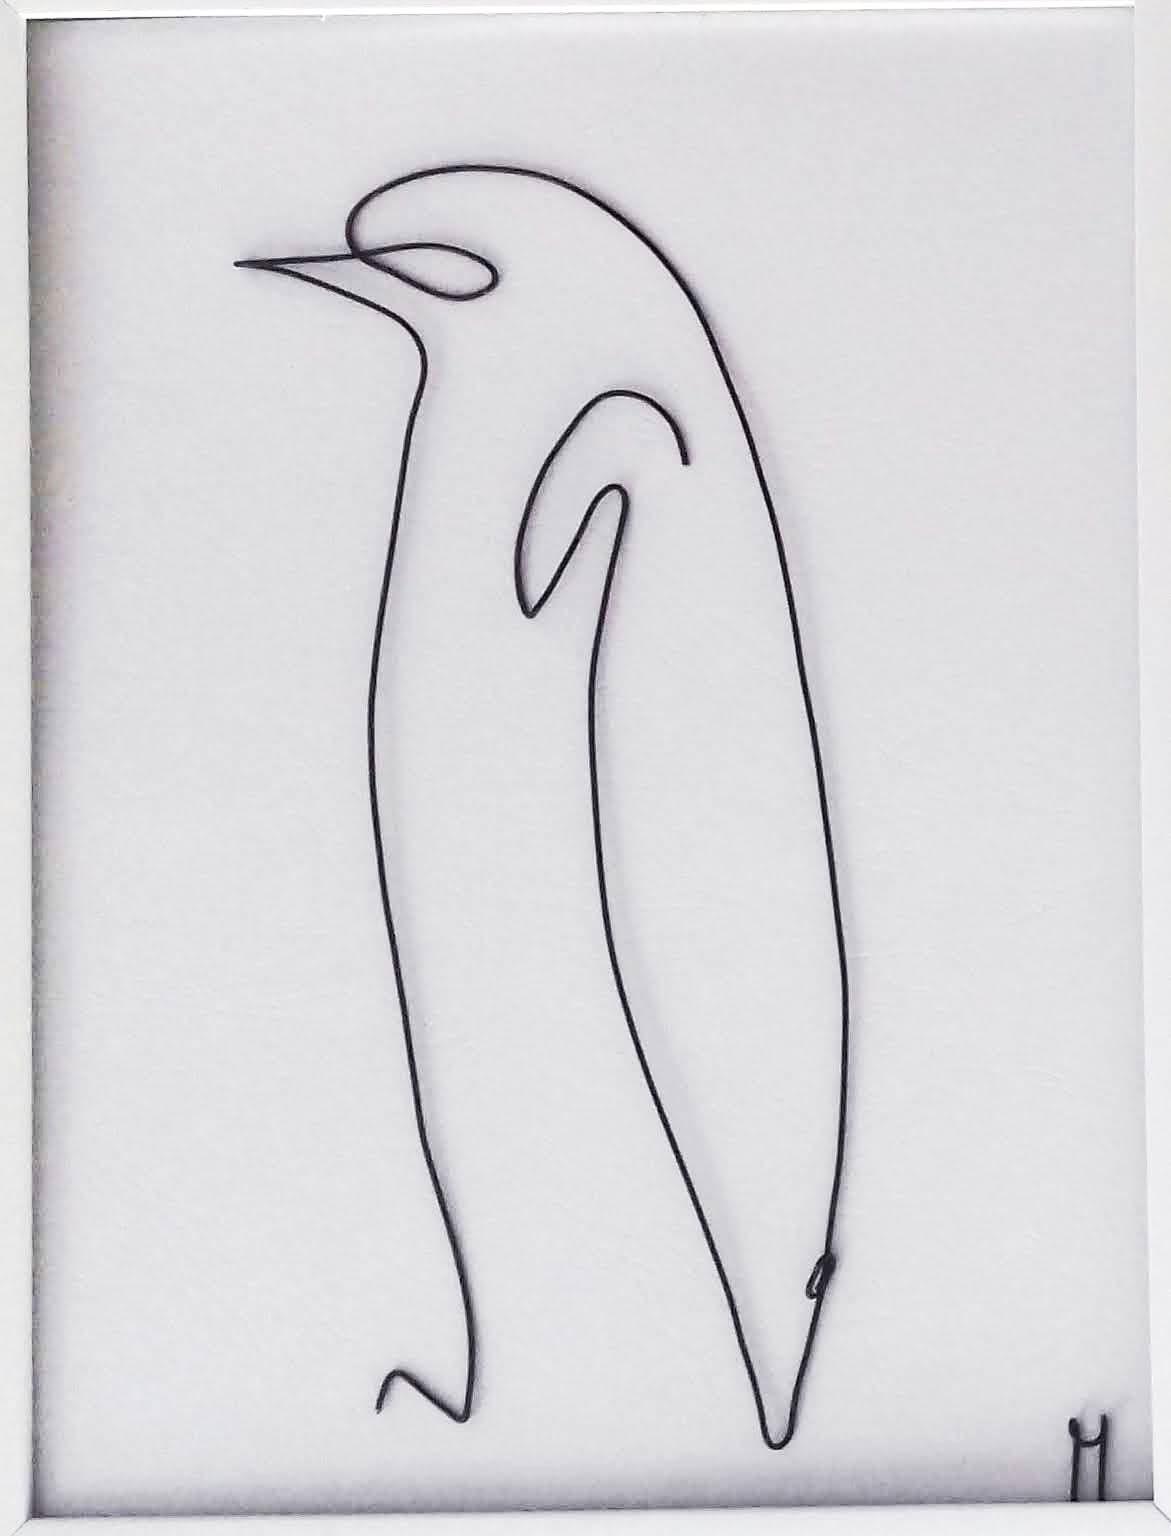 Picasso Penguin 20181018_114439-1